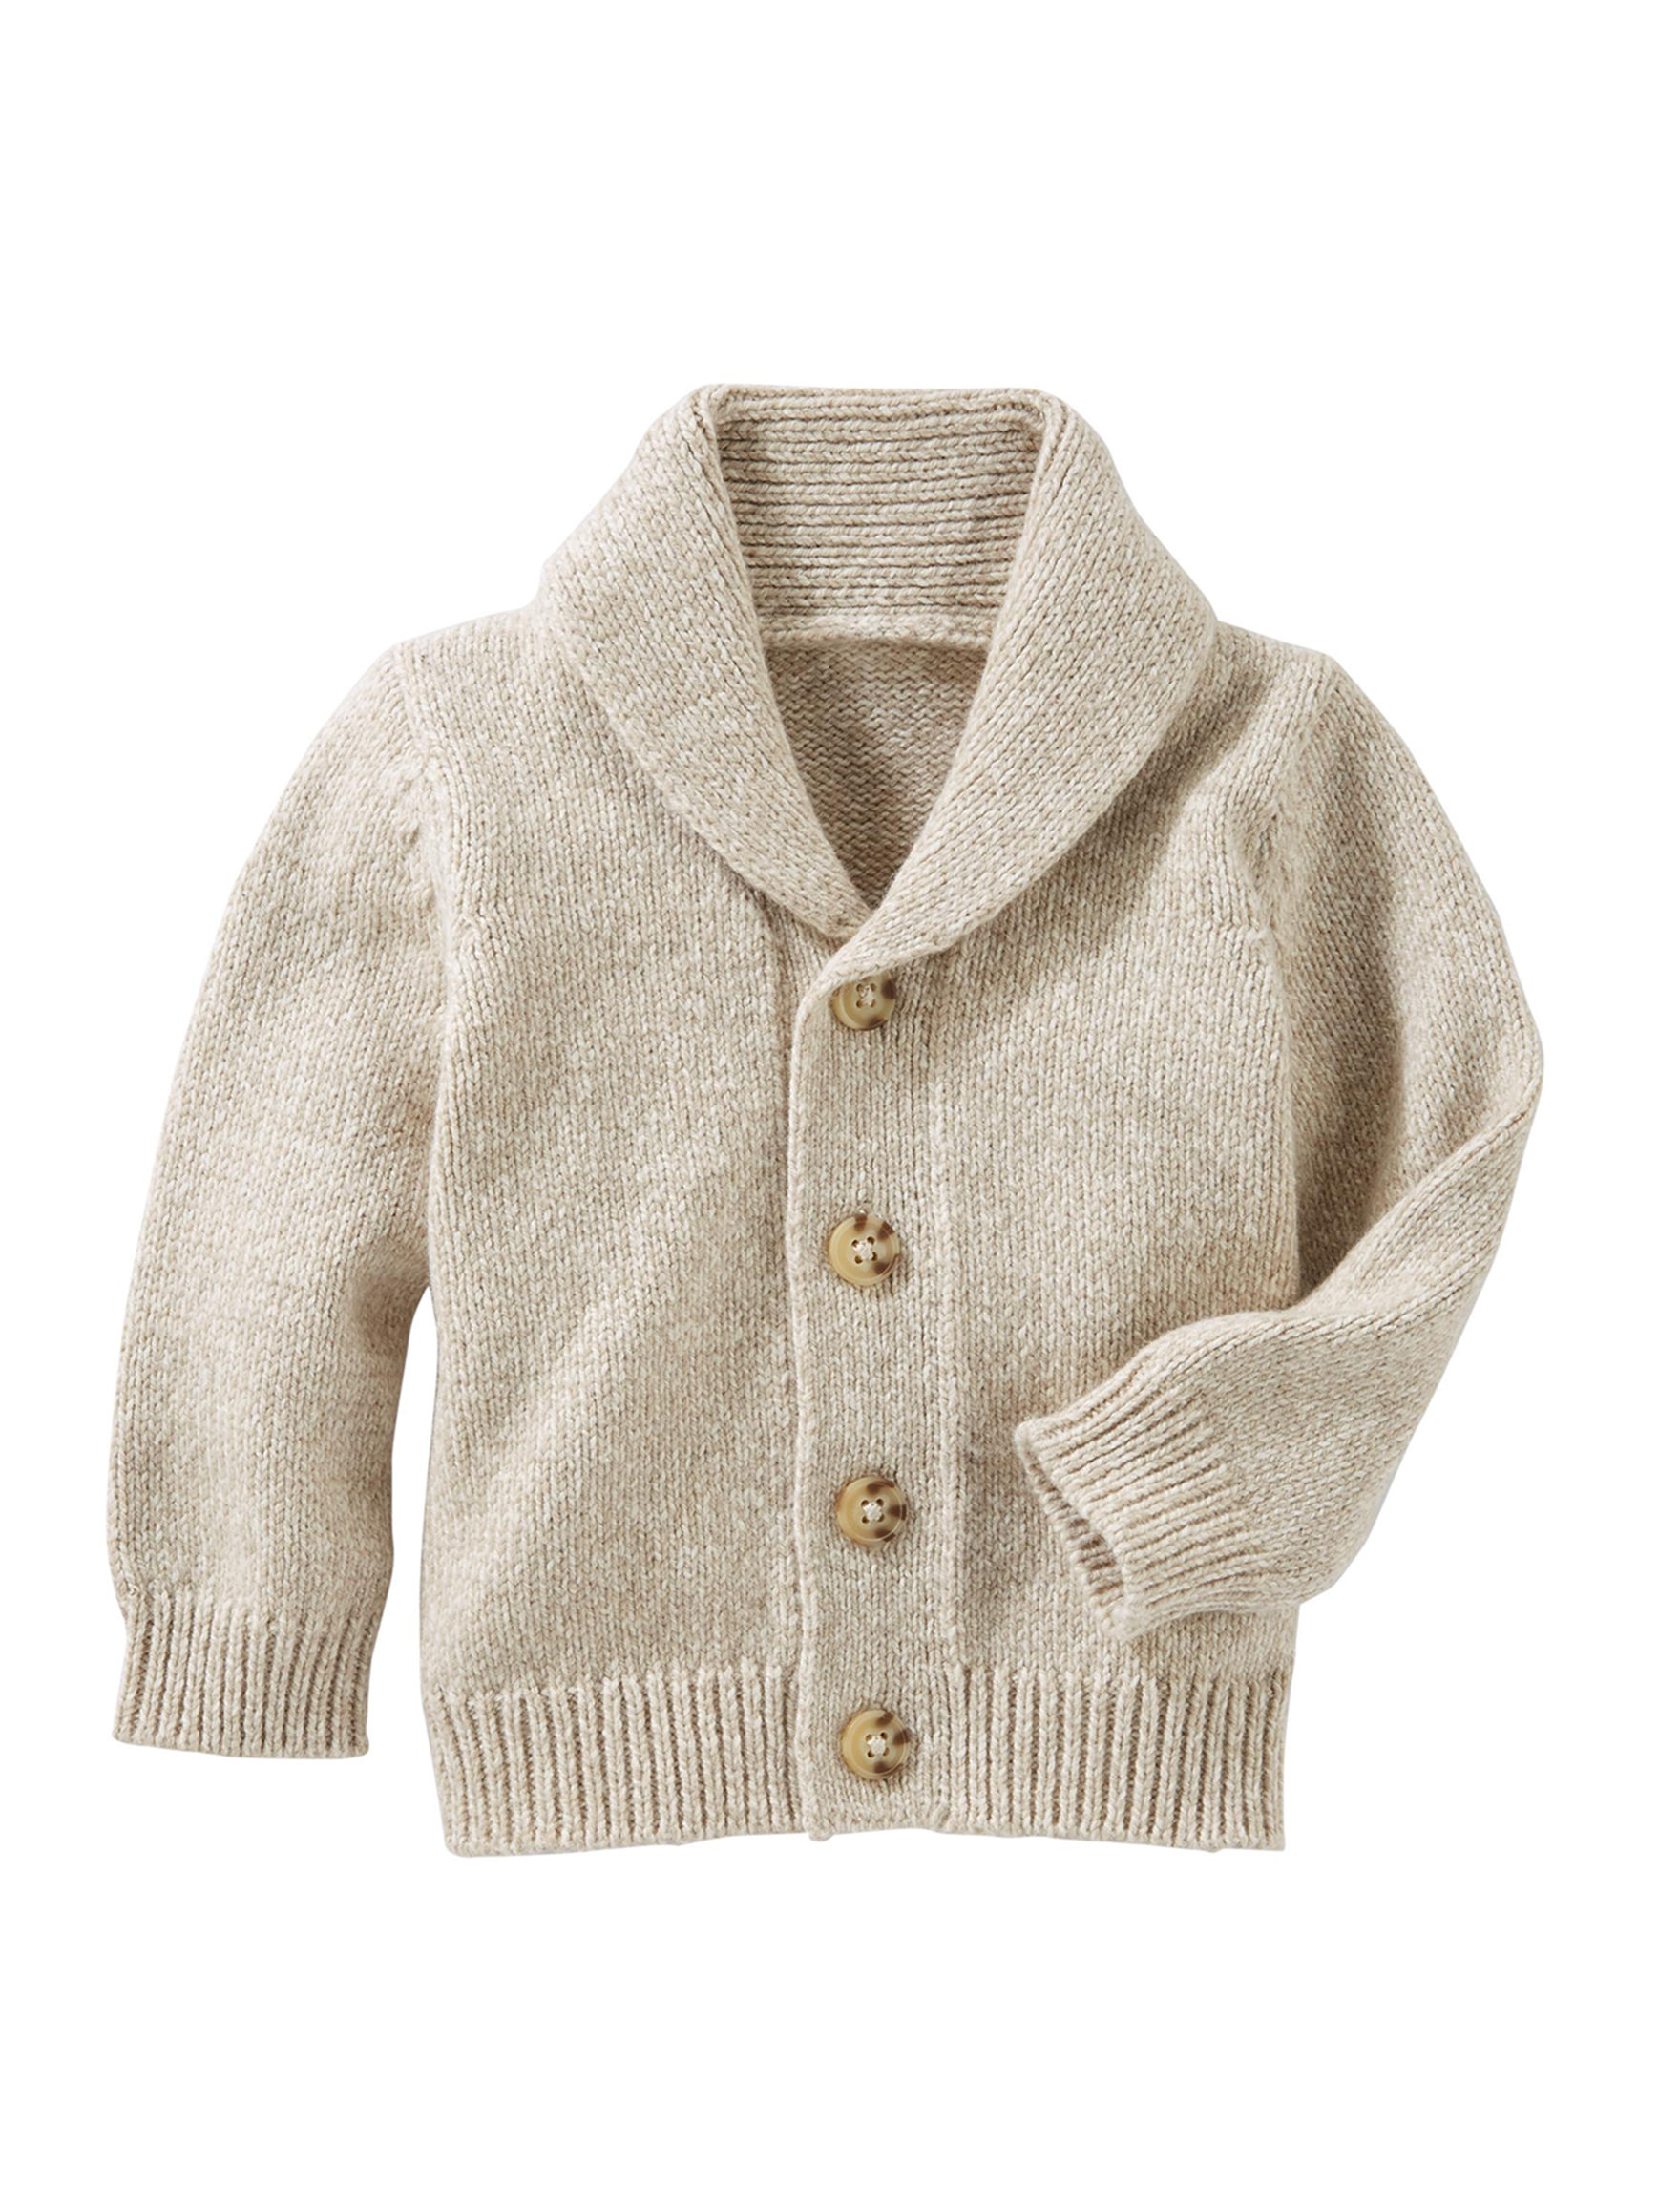 Oshkosh B'Gosh Beige Sweaters